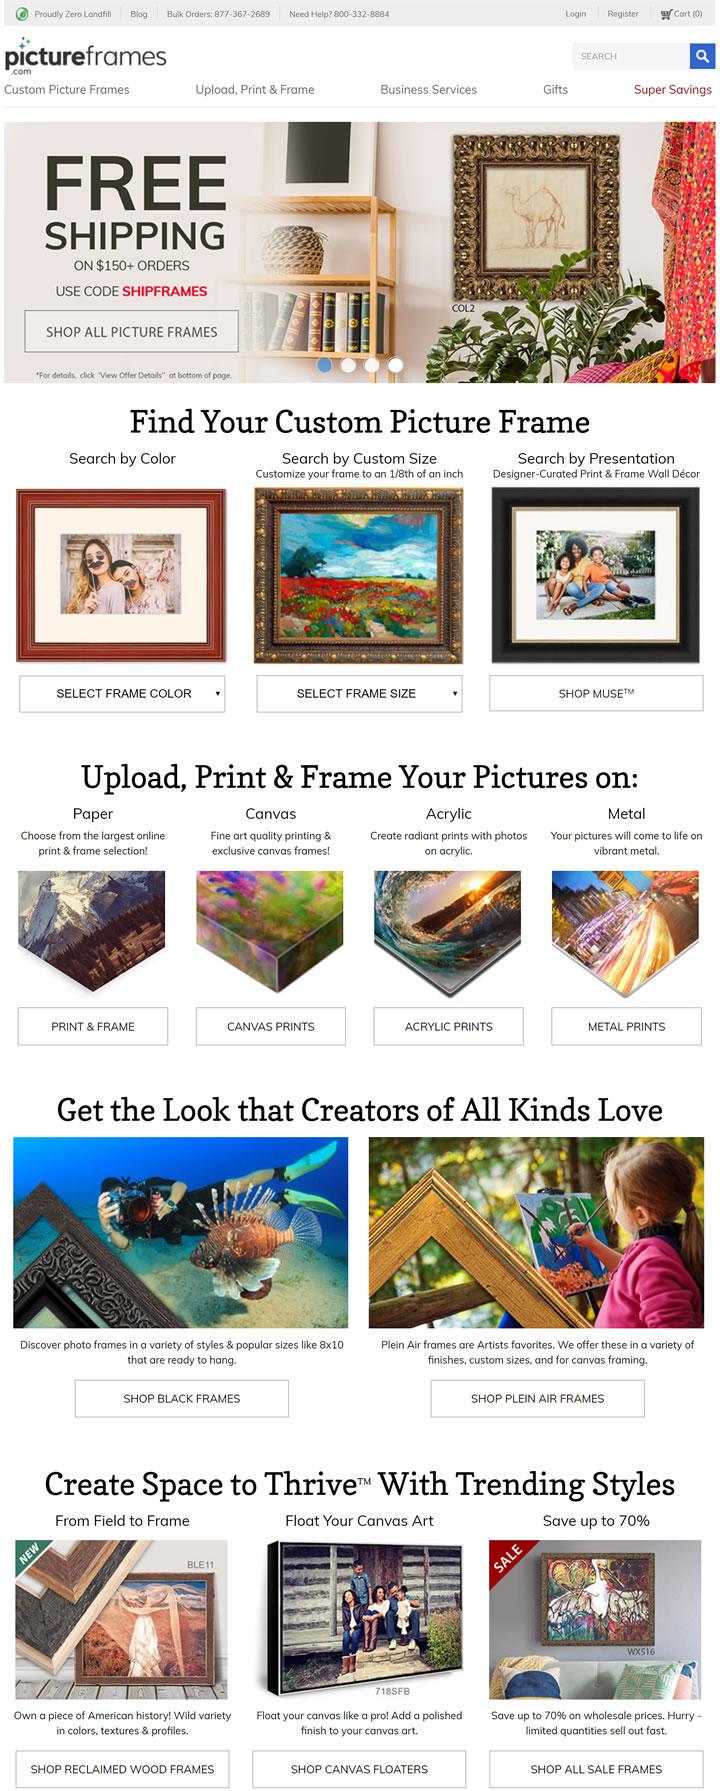 购买美国制造的相框和画框架:Picture Frames